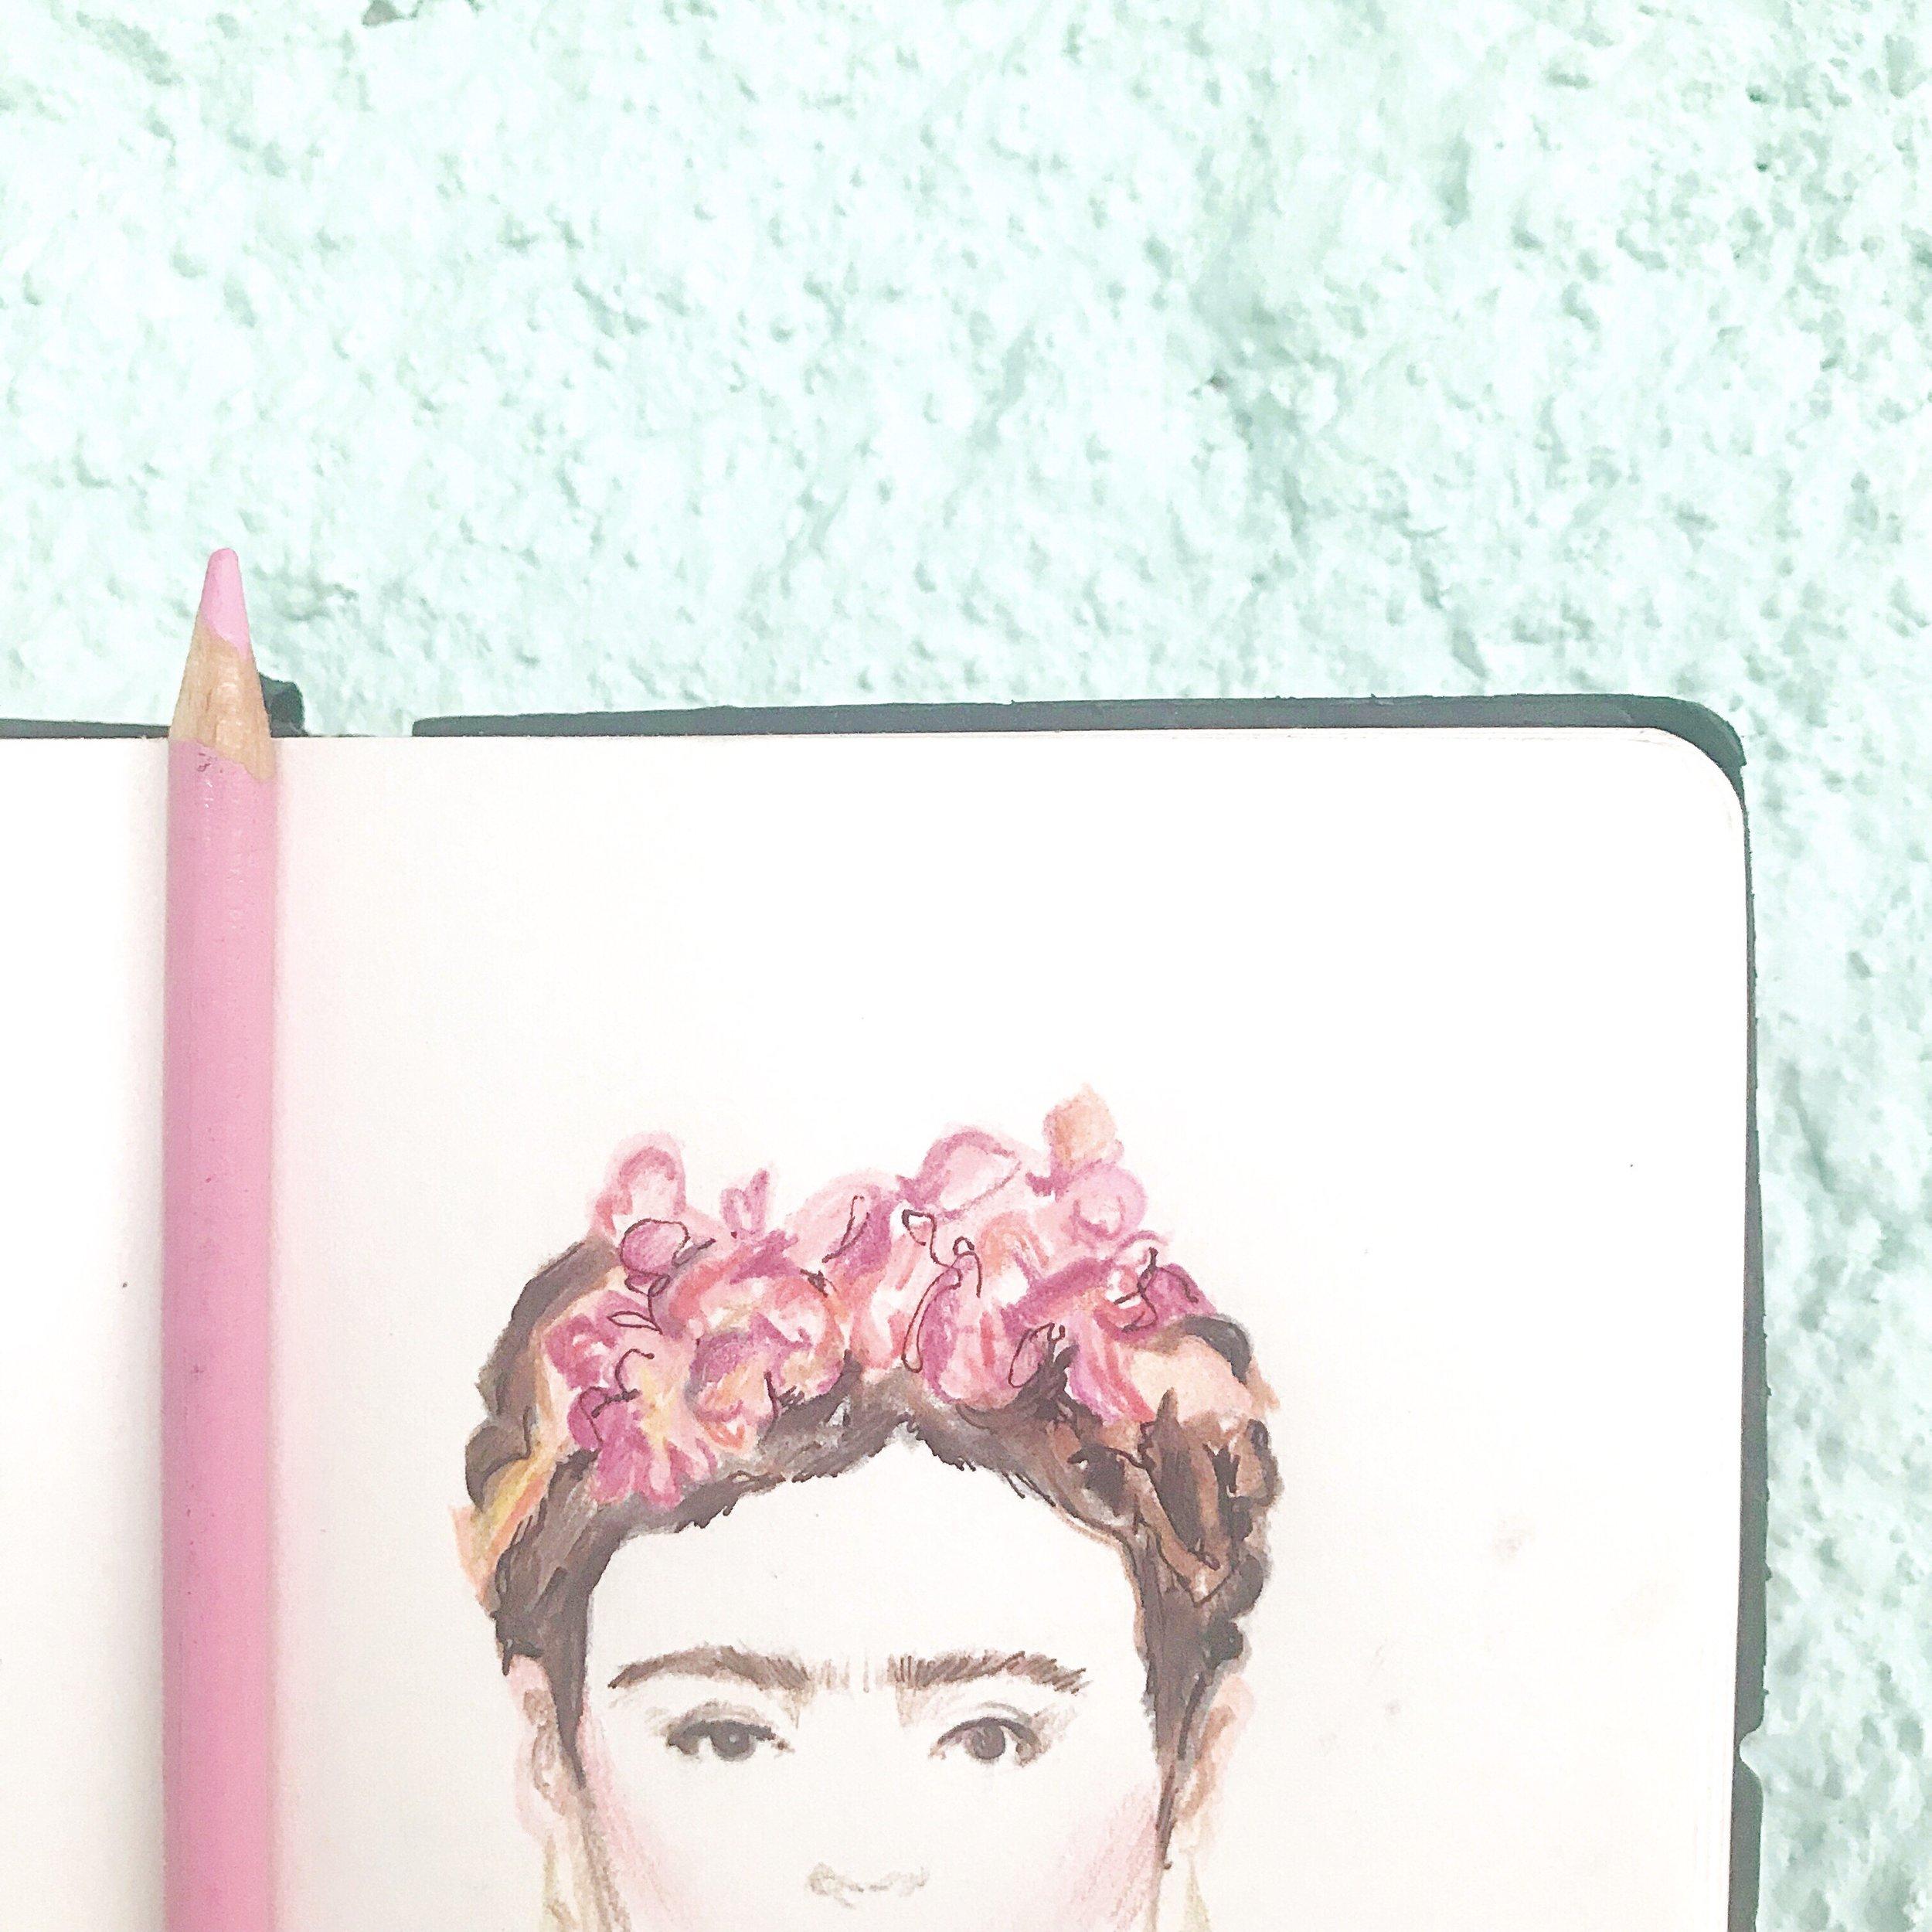 Bryony-Fripp-Illustrator-Frida-Kahlo.JPG